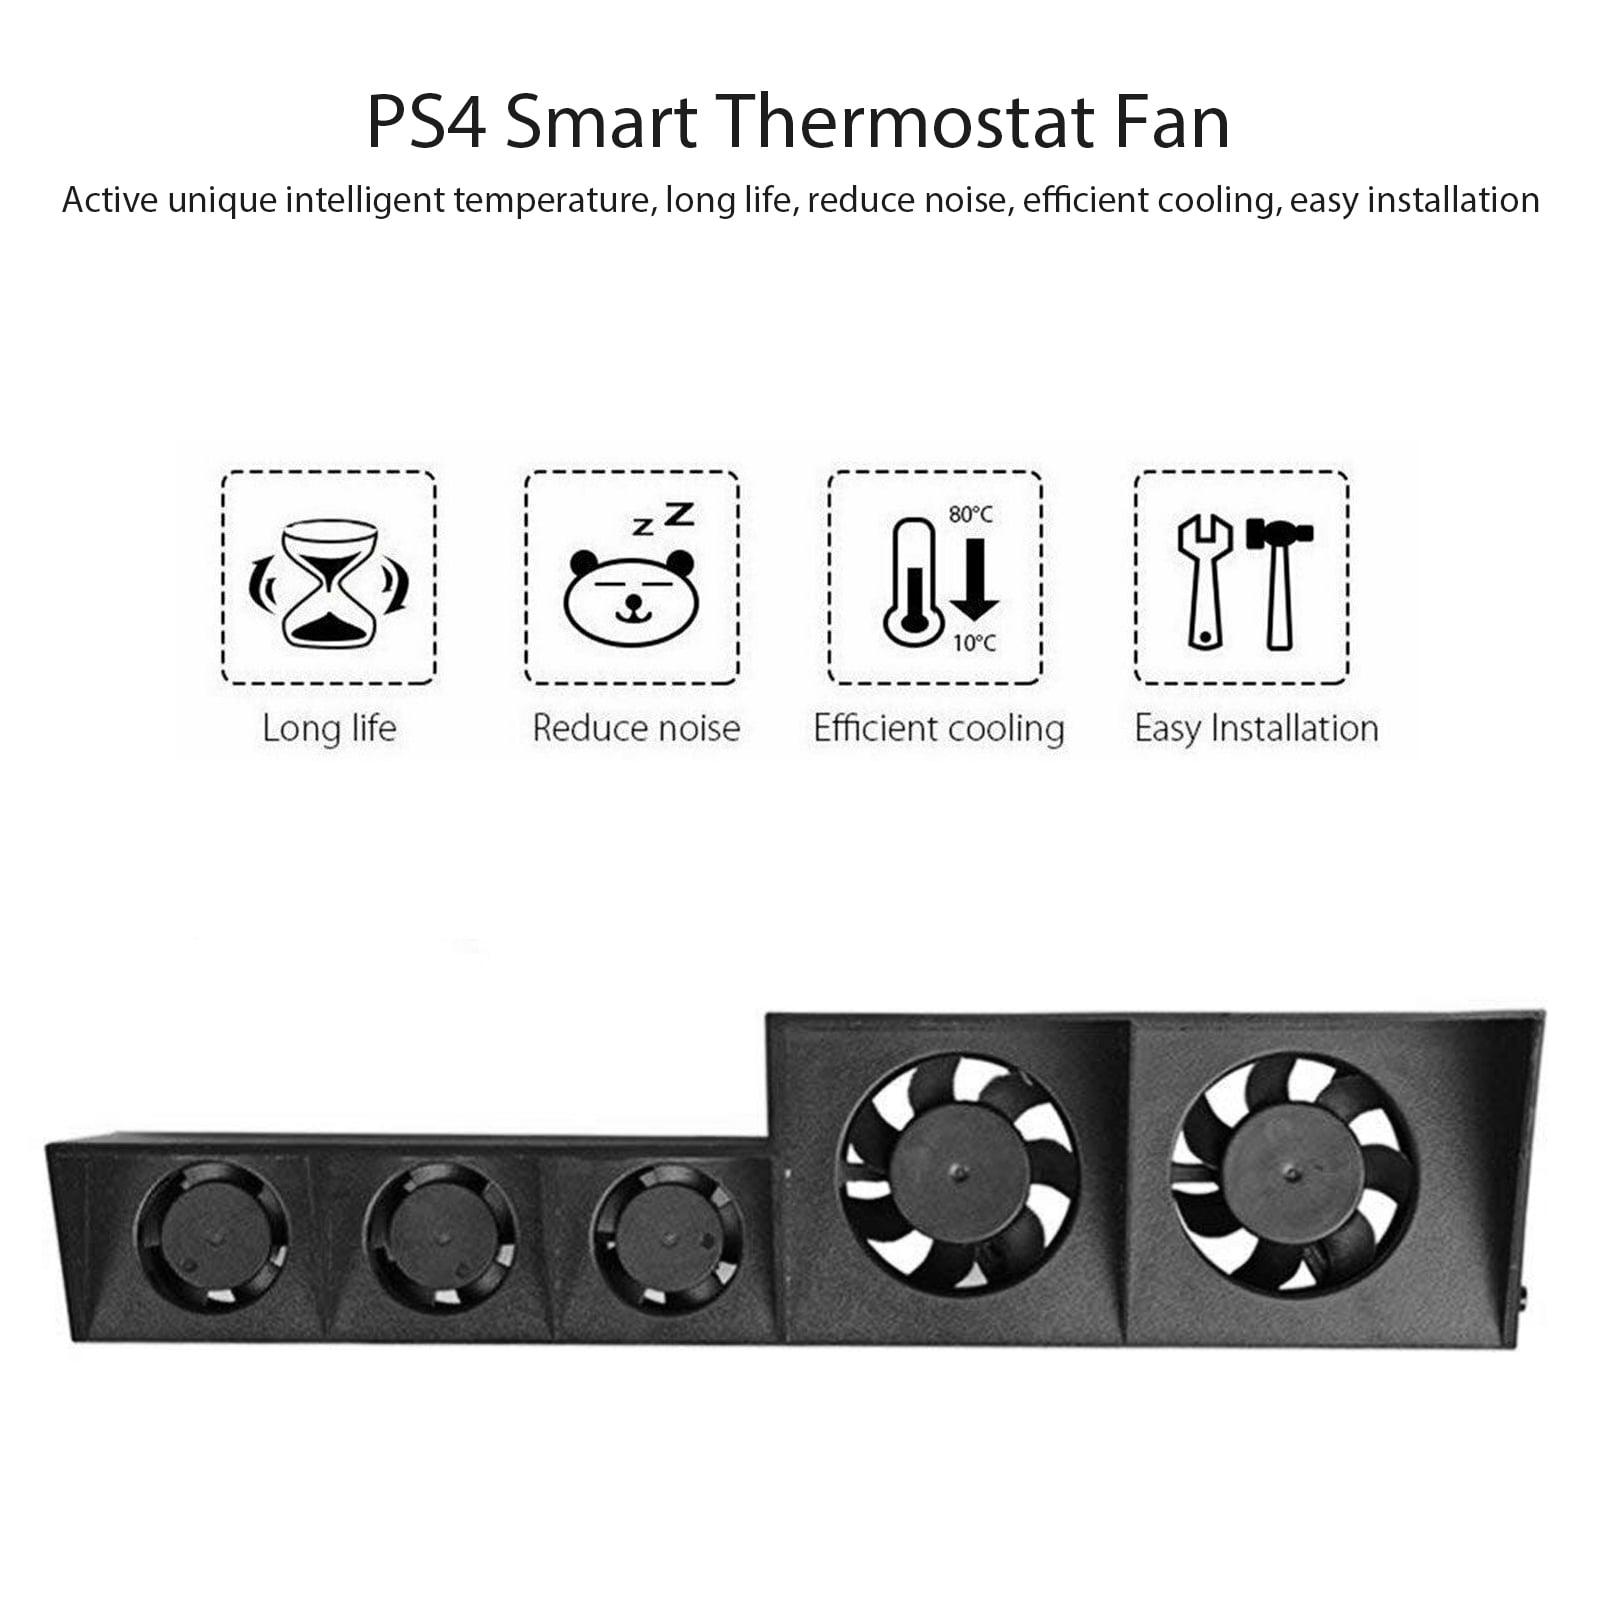 R&B USB External Turbo Temperature Control Cooling 5 Fan Cooler ...